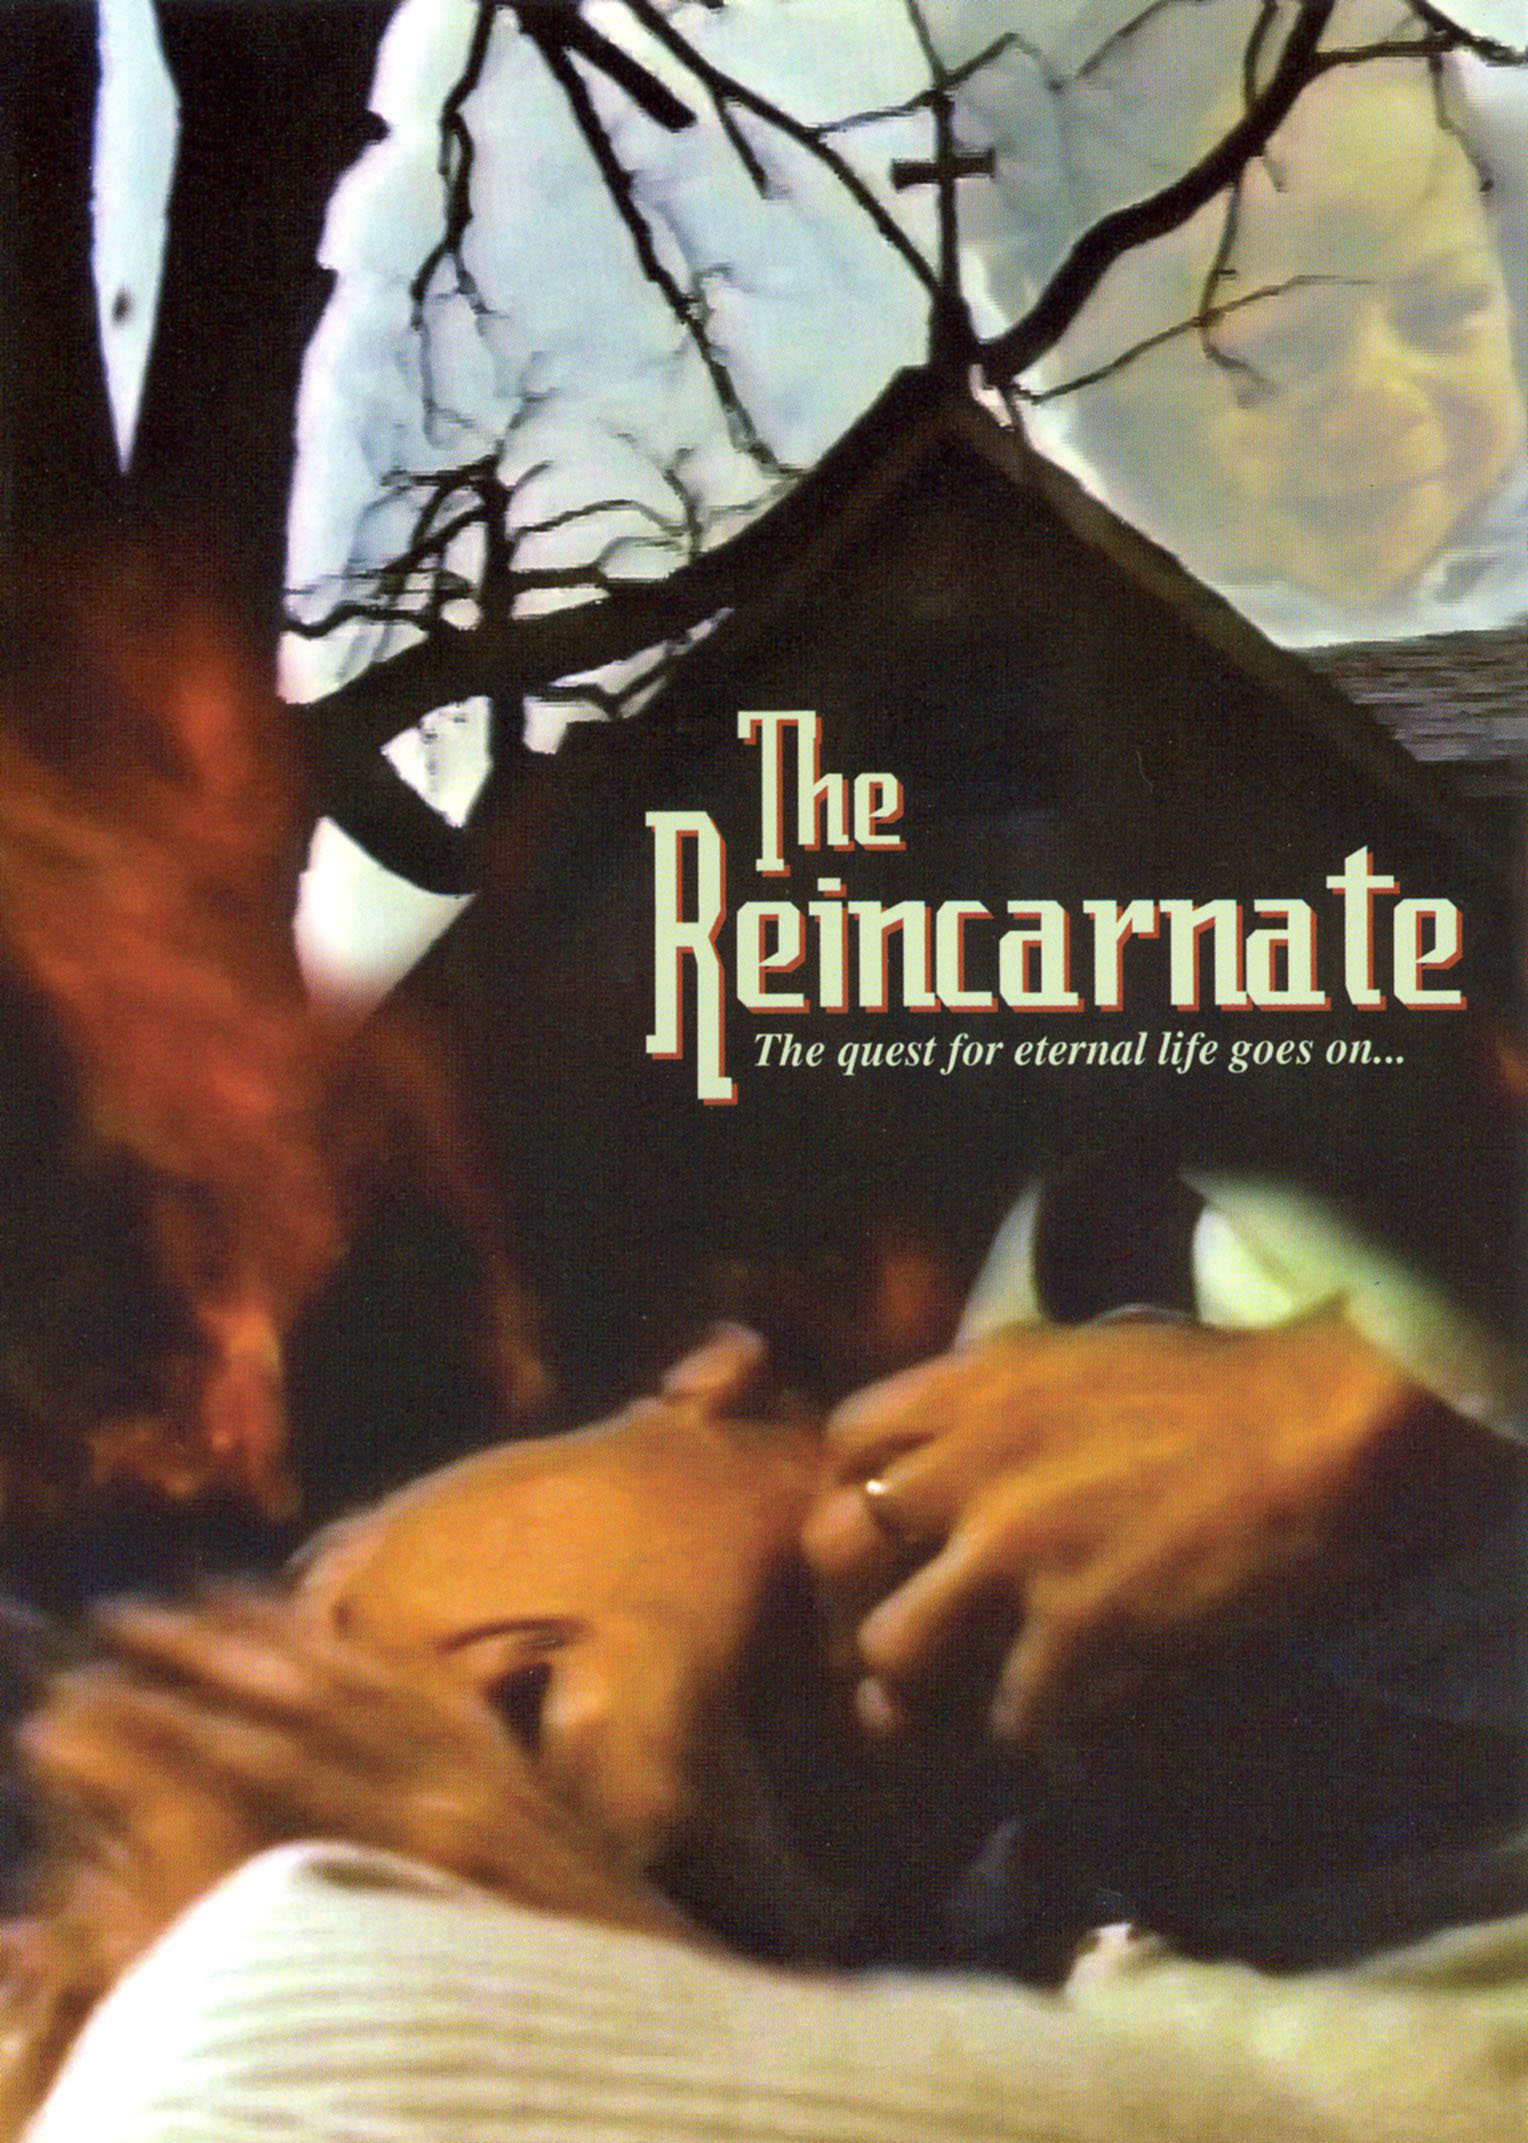 The Reincarnate